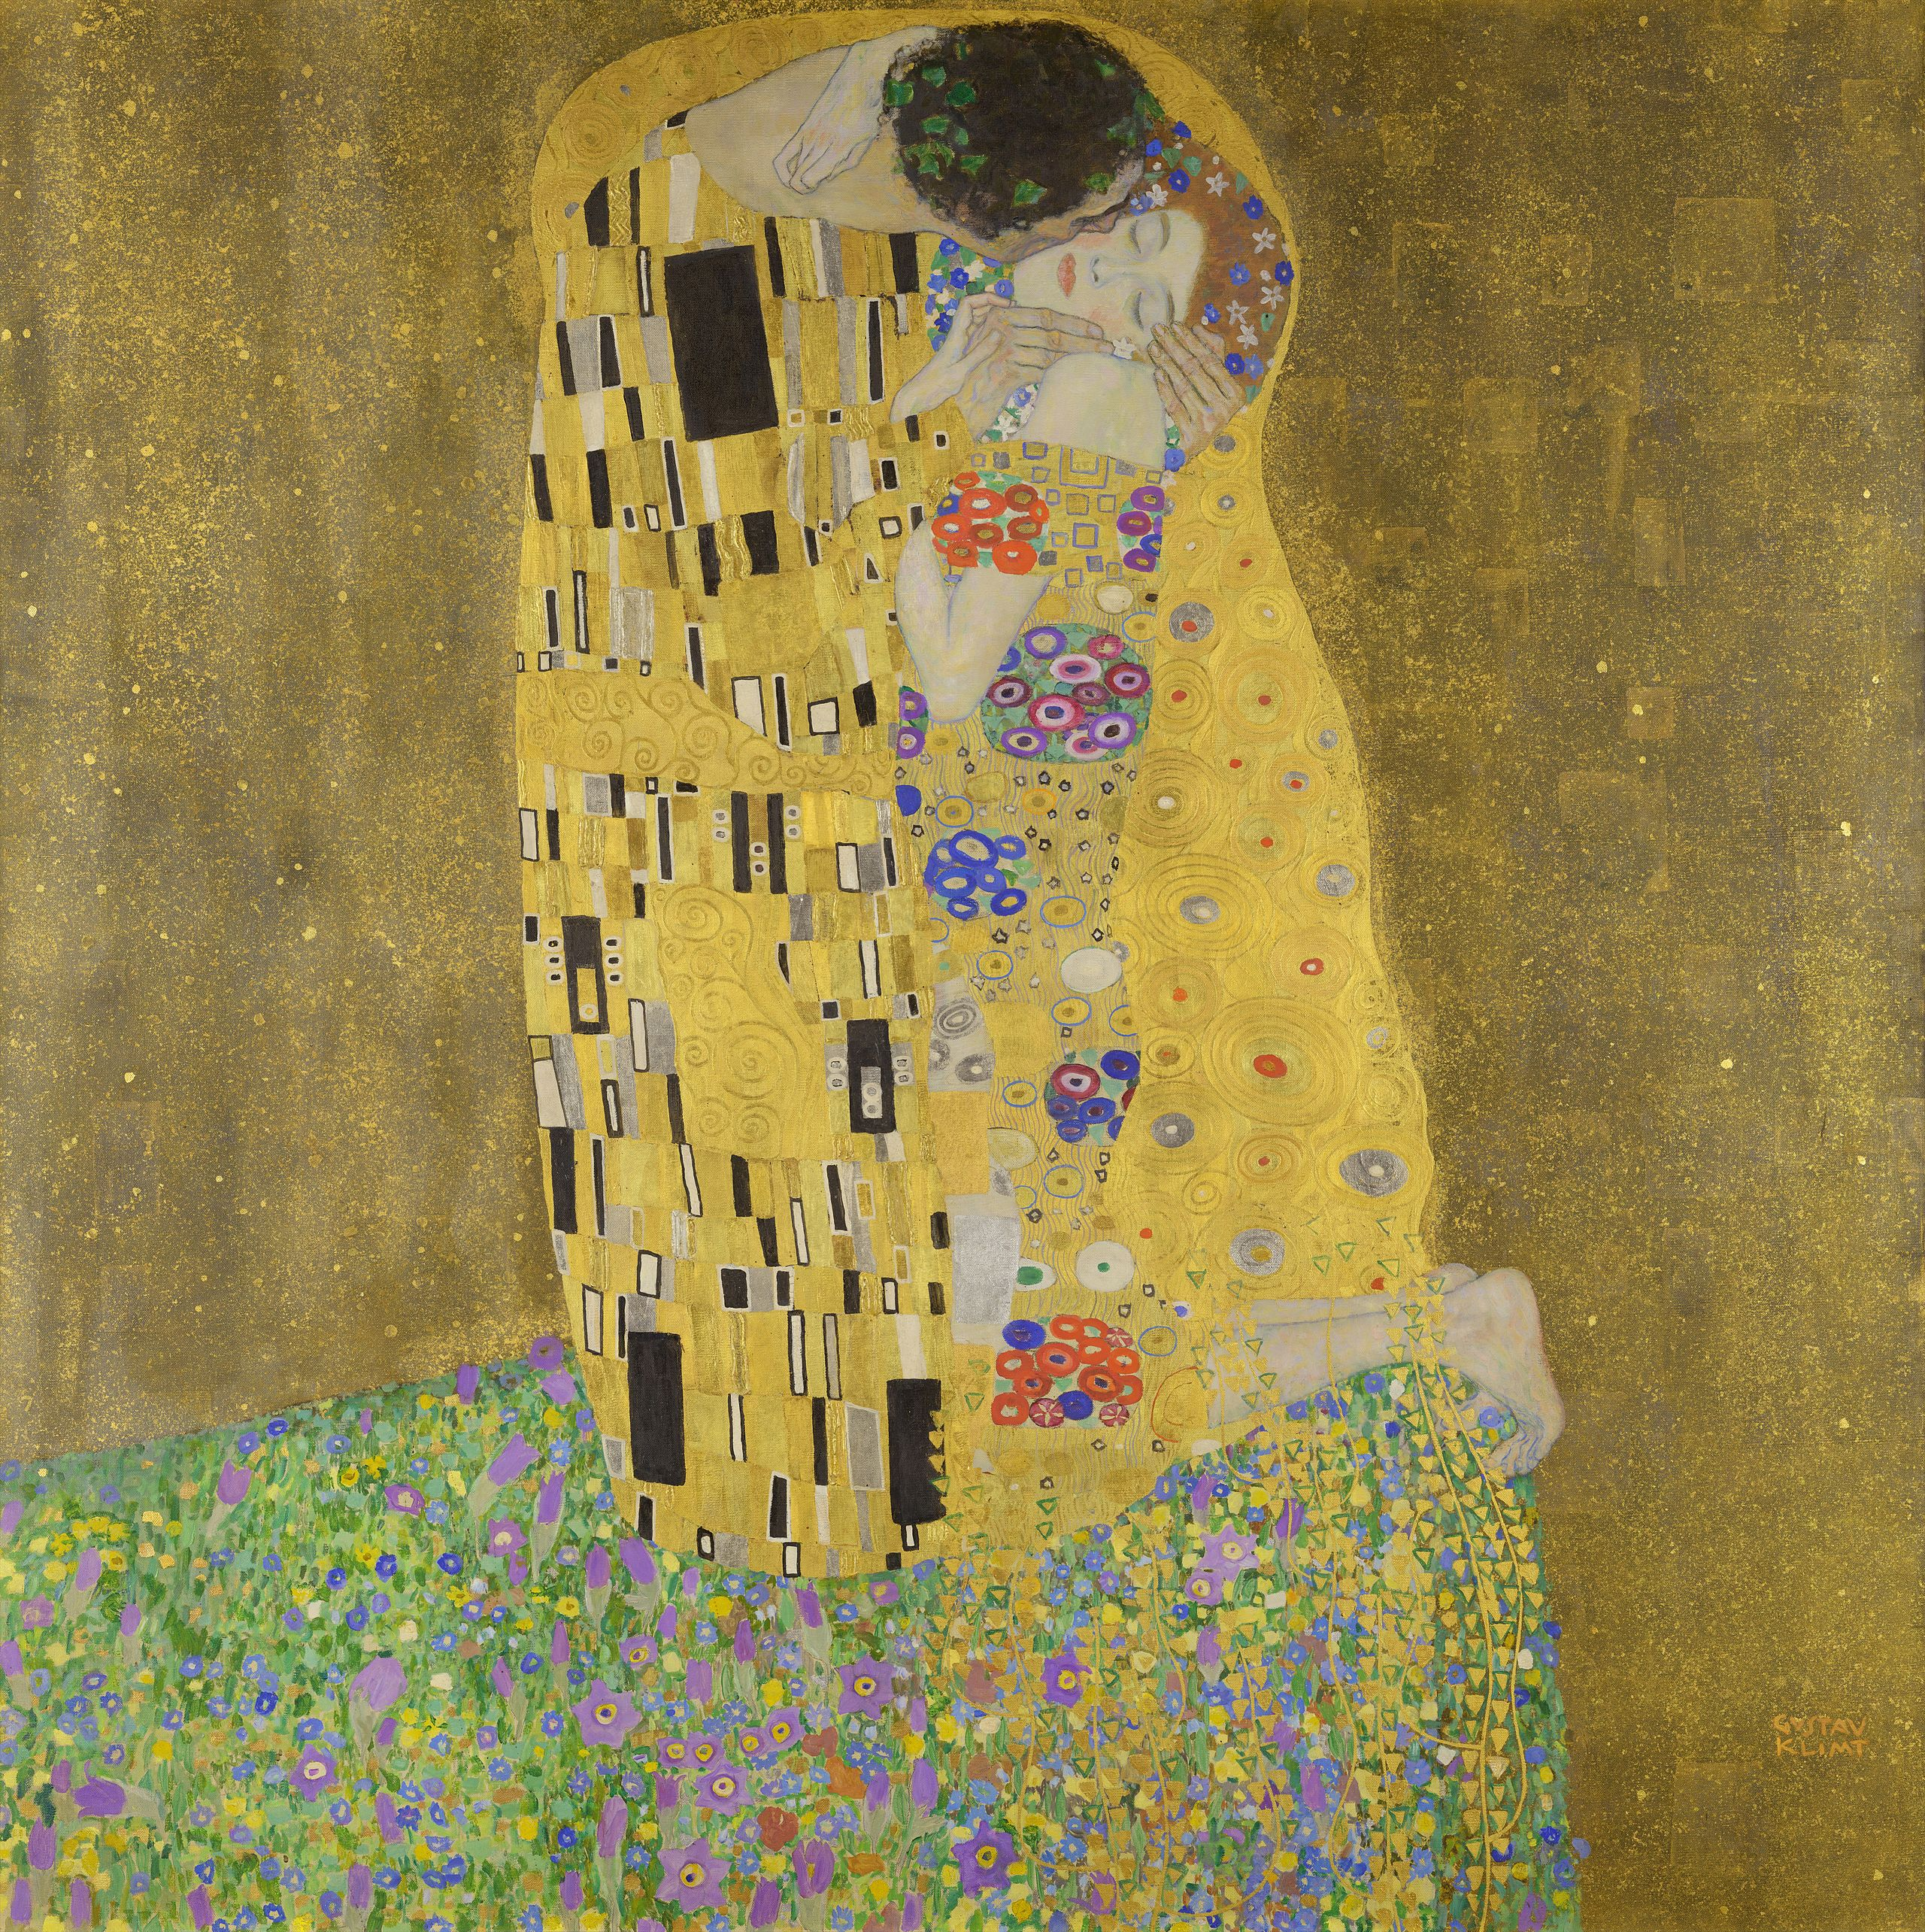 Cuadros Famosos: El beso (Der Kuss)